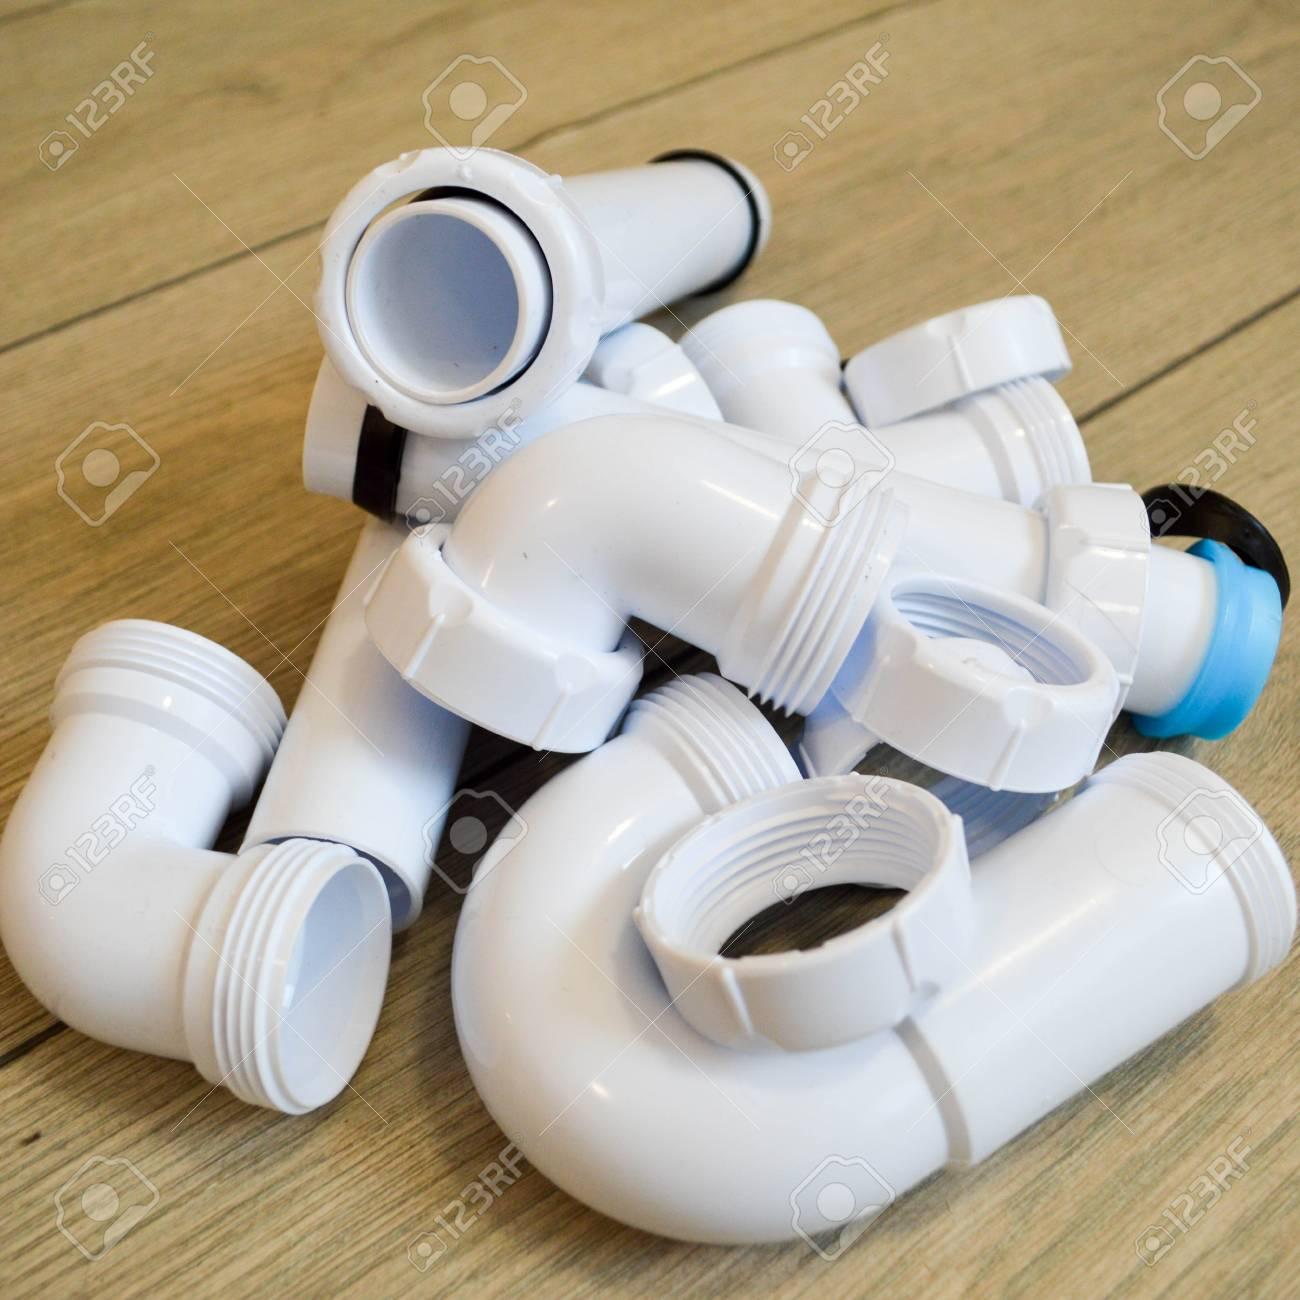 Turbo Weiße Kunststoff-Sanitär-, Sanitär-Rohre, Glatt Und Gebogen KF73